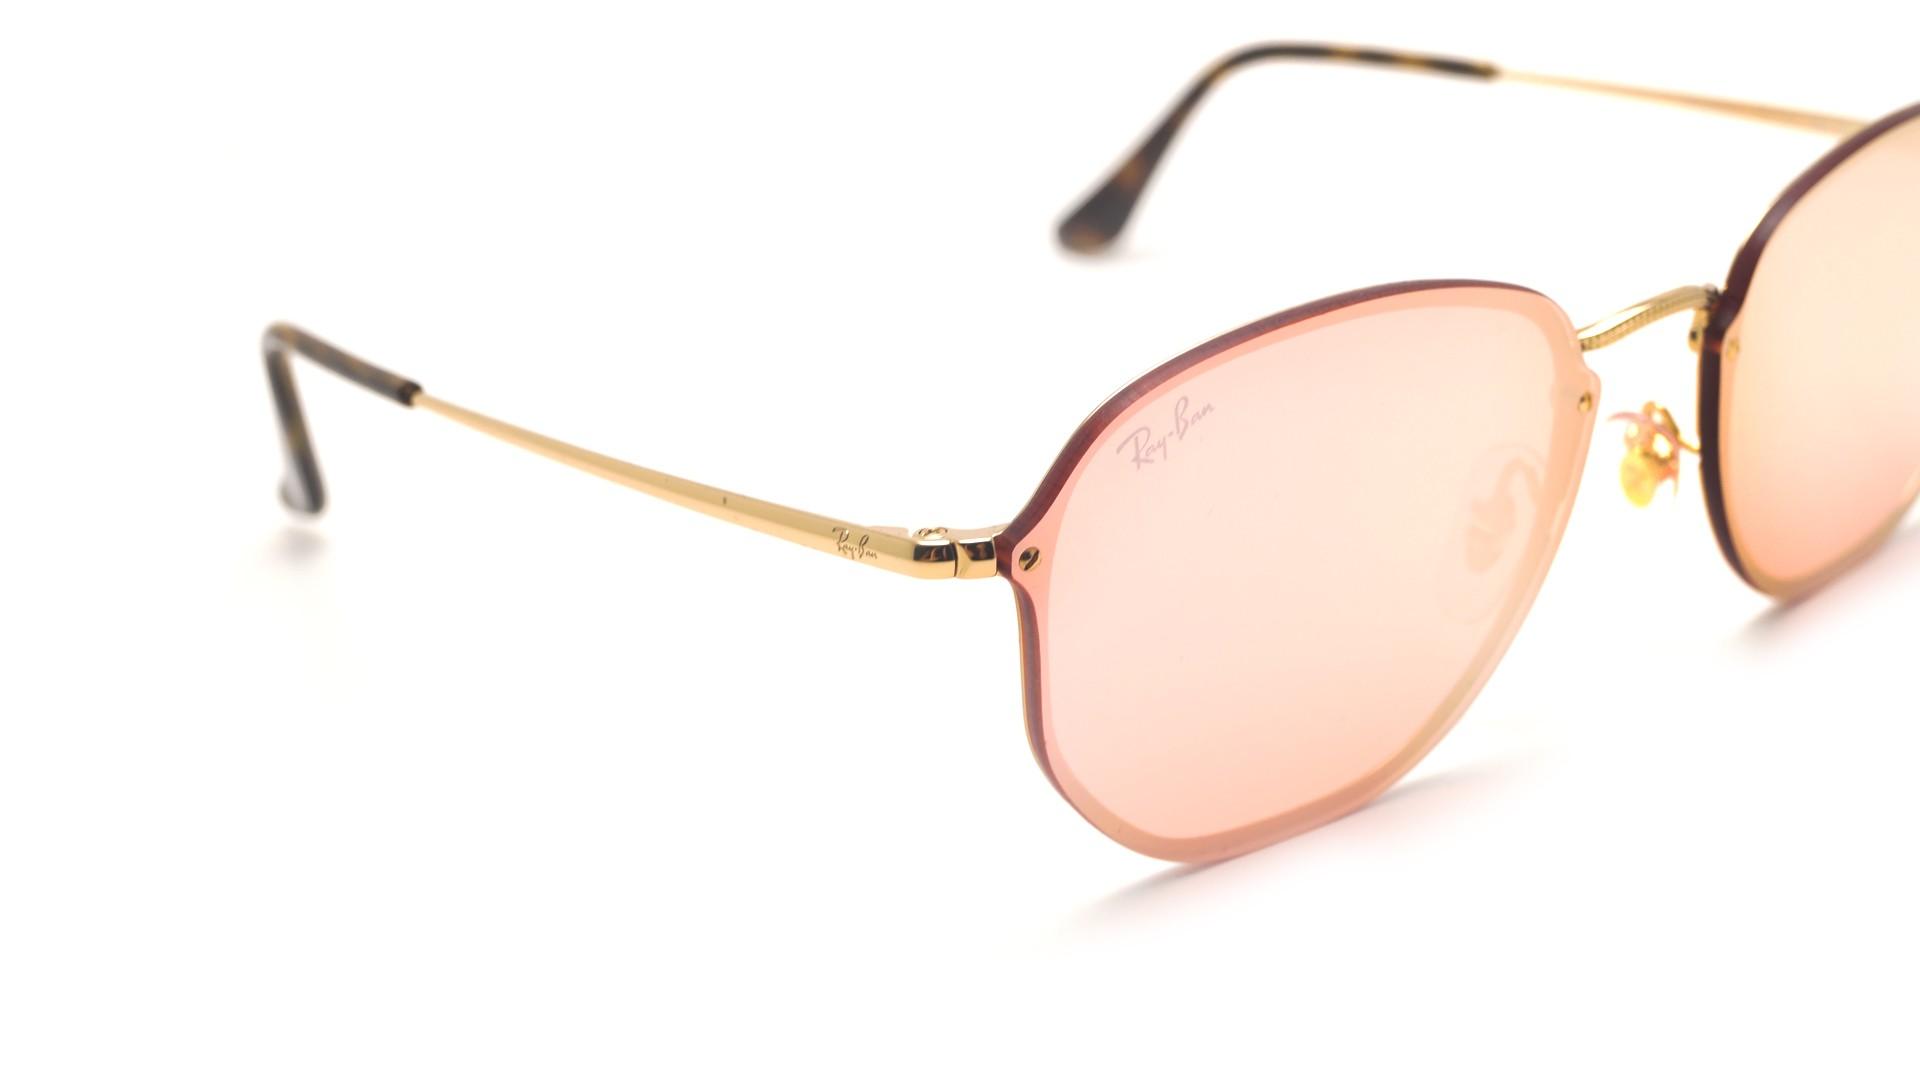 07f414c1a6d Sunglasses Ray-Ban Hexagonal Blaze Gold RB3579N 001 E4 58-15 Large Mirror